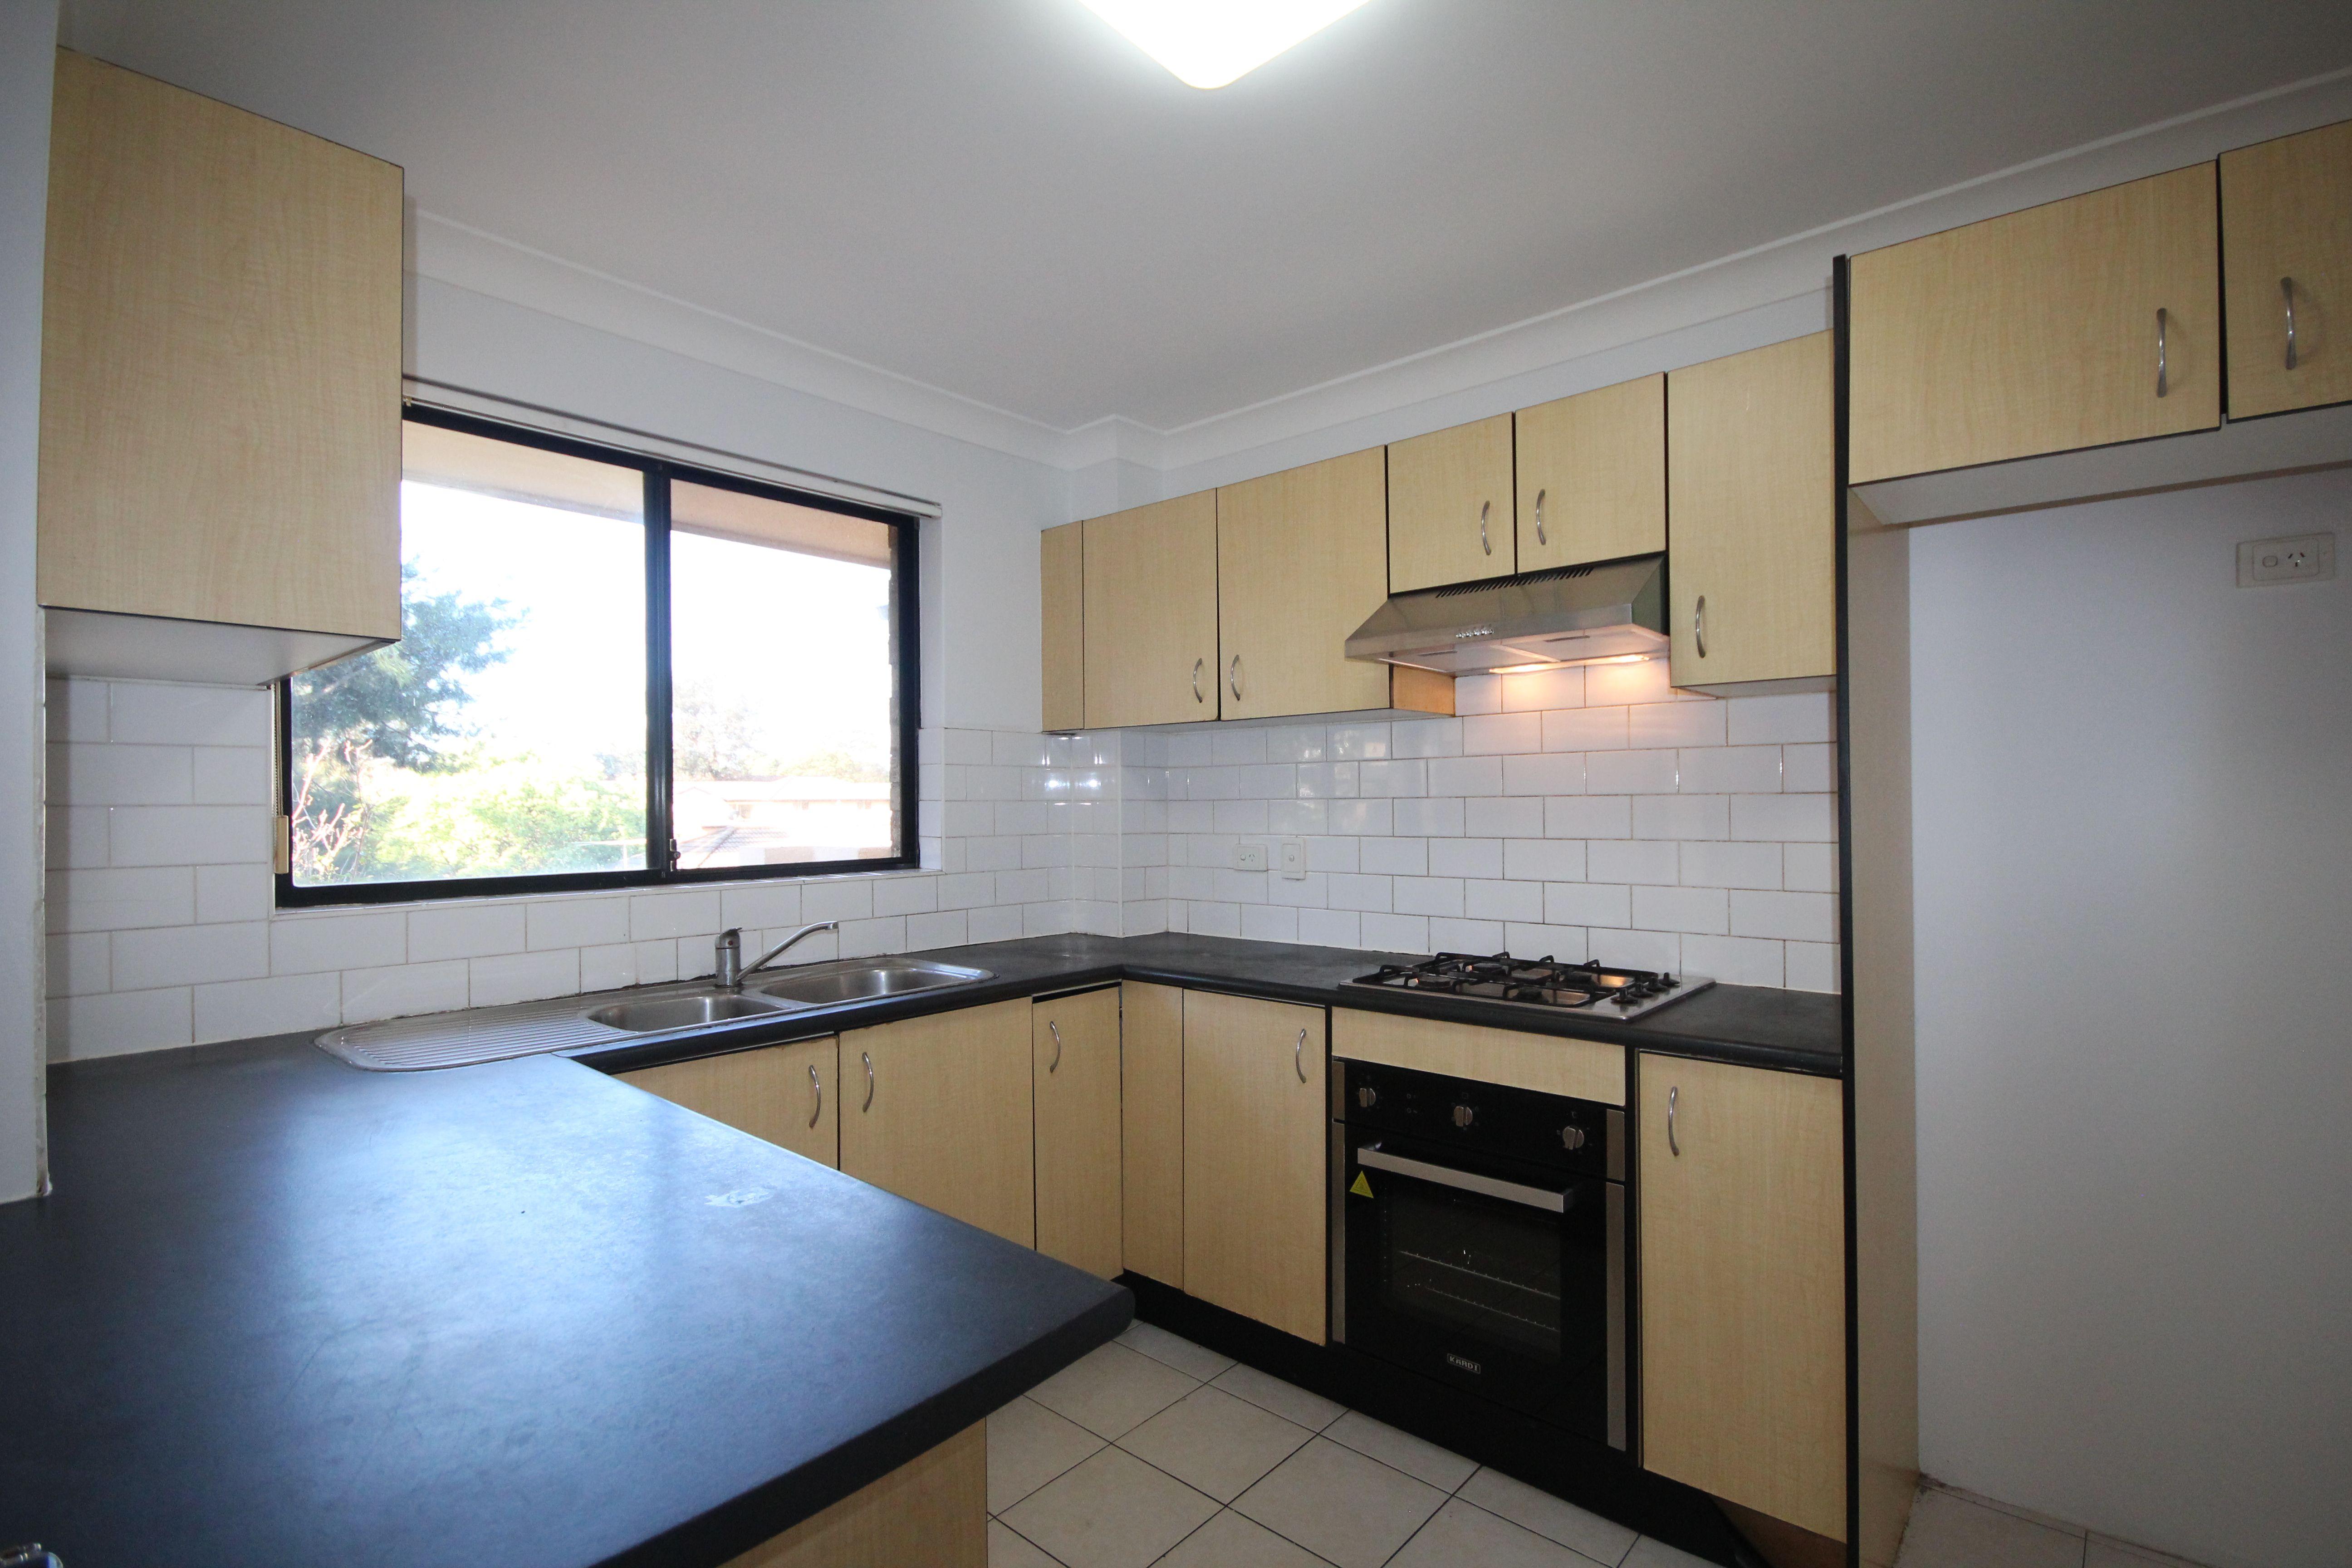 19/45-49 Hall Street, Auburn NSW 2144